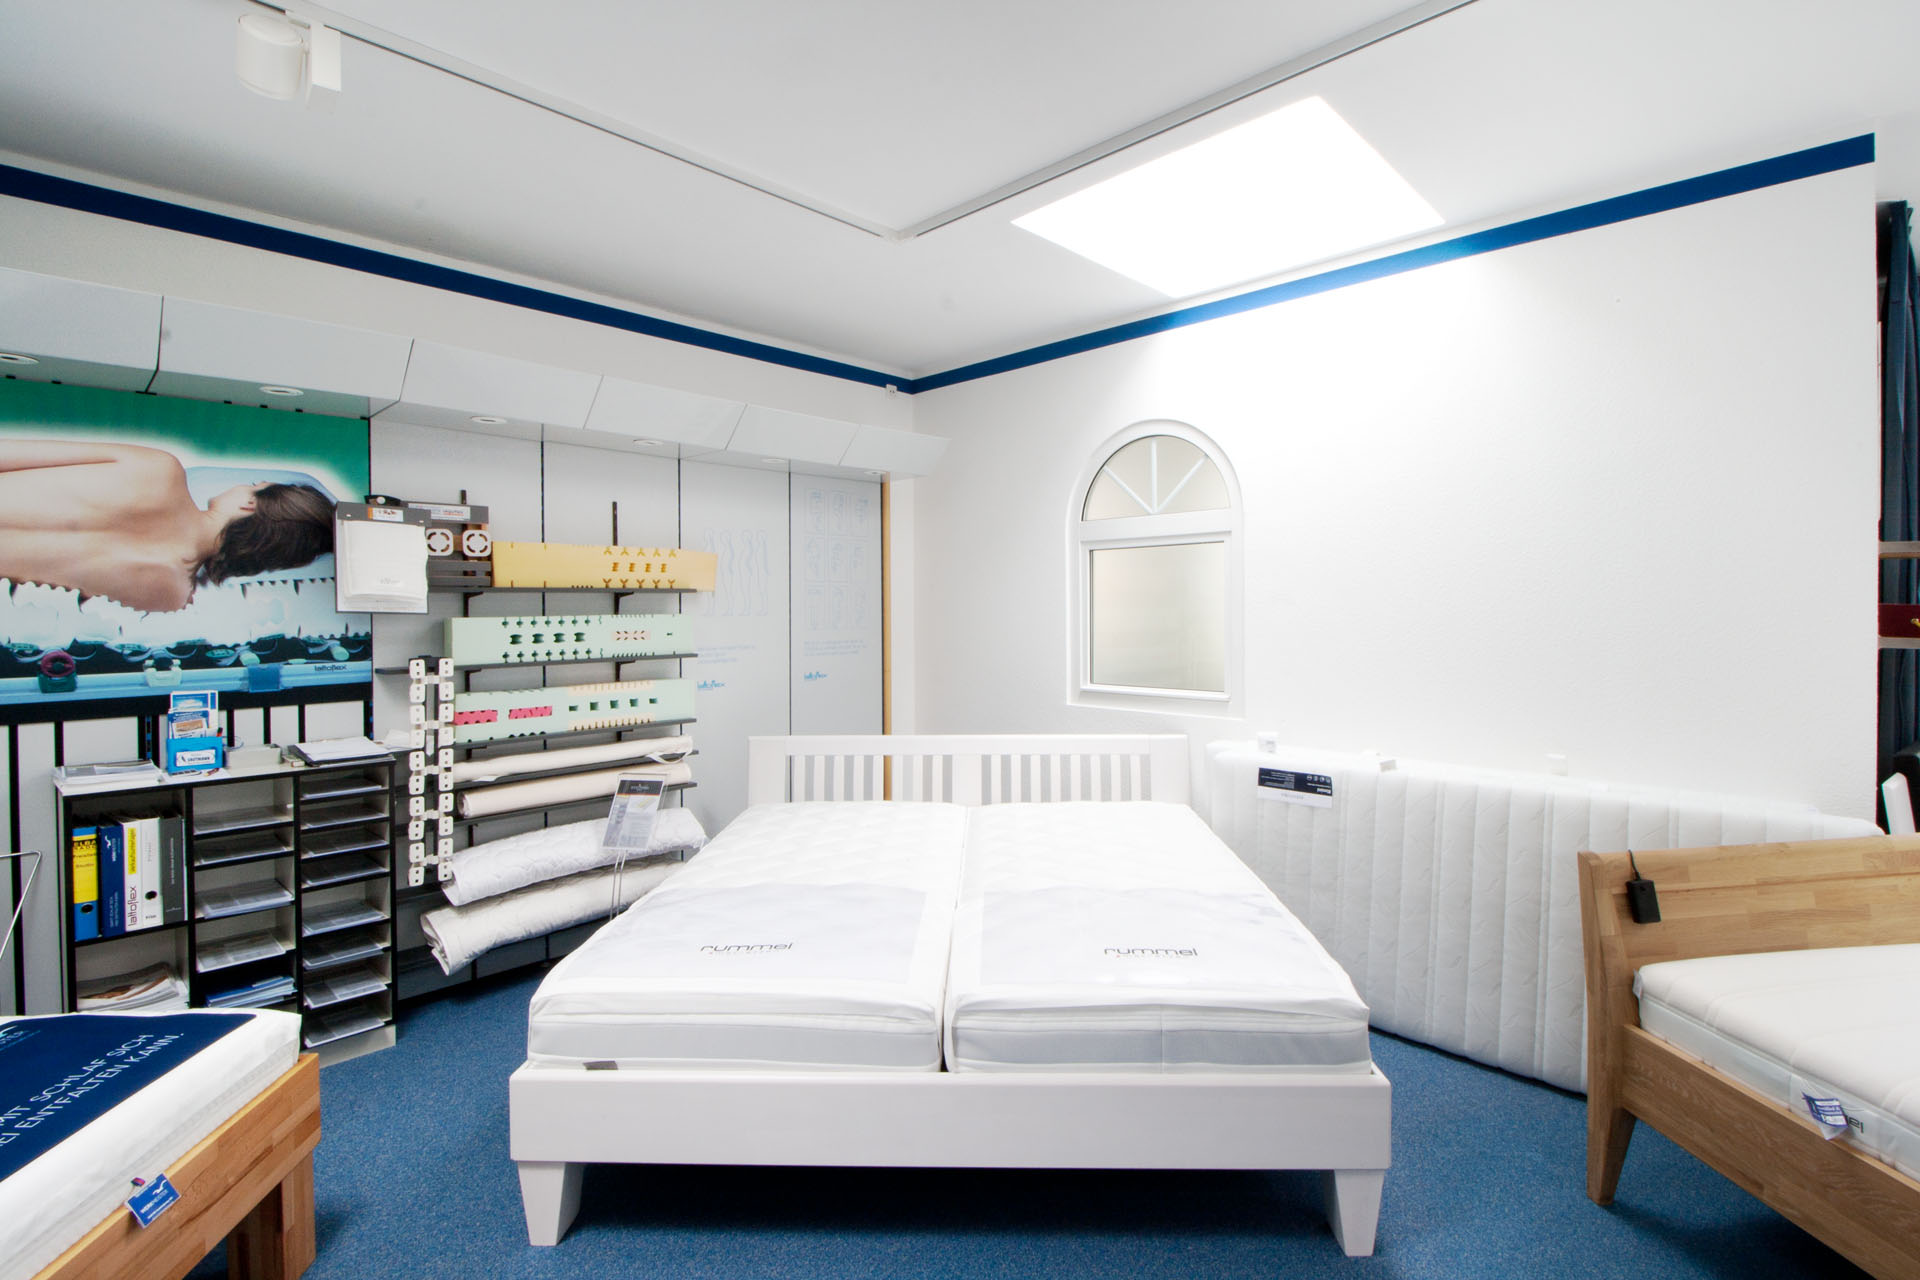 matratzen betten sautmann. Black Bedroom Furniture Sets. Home Design Ideas